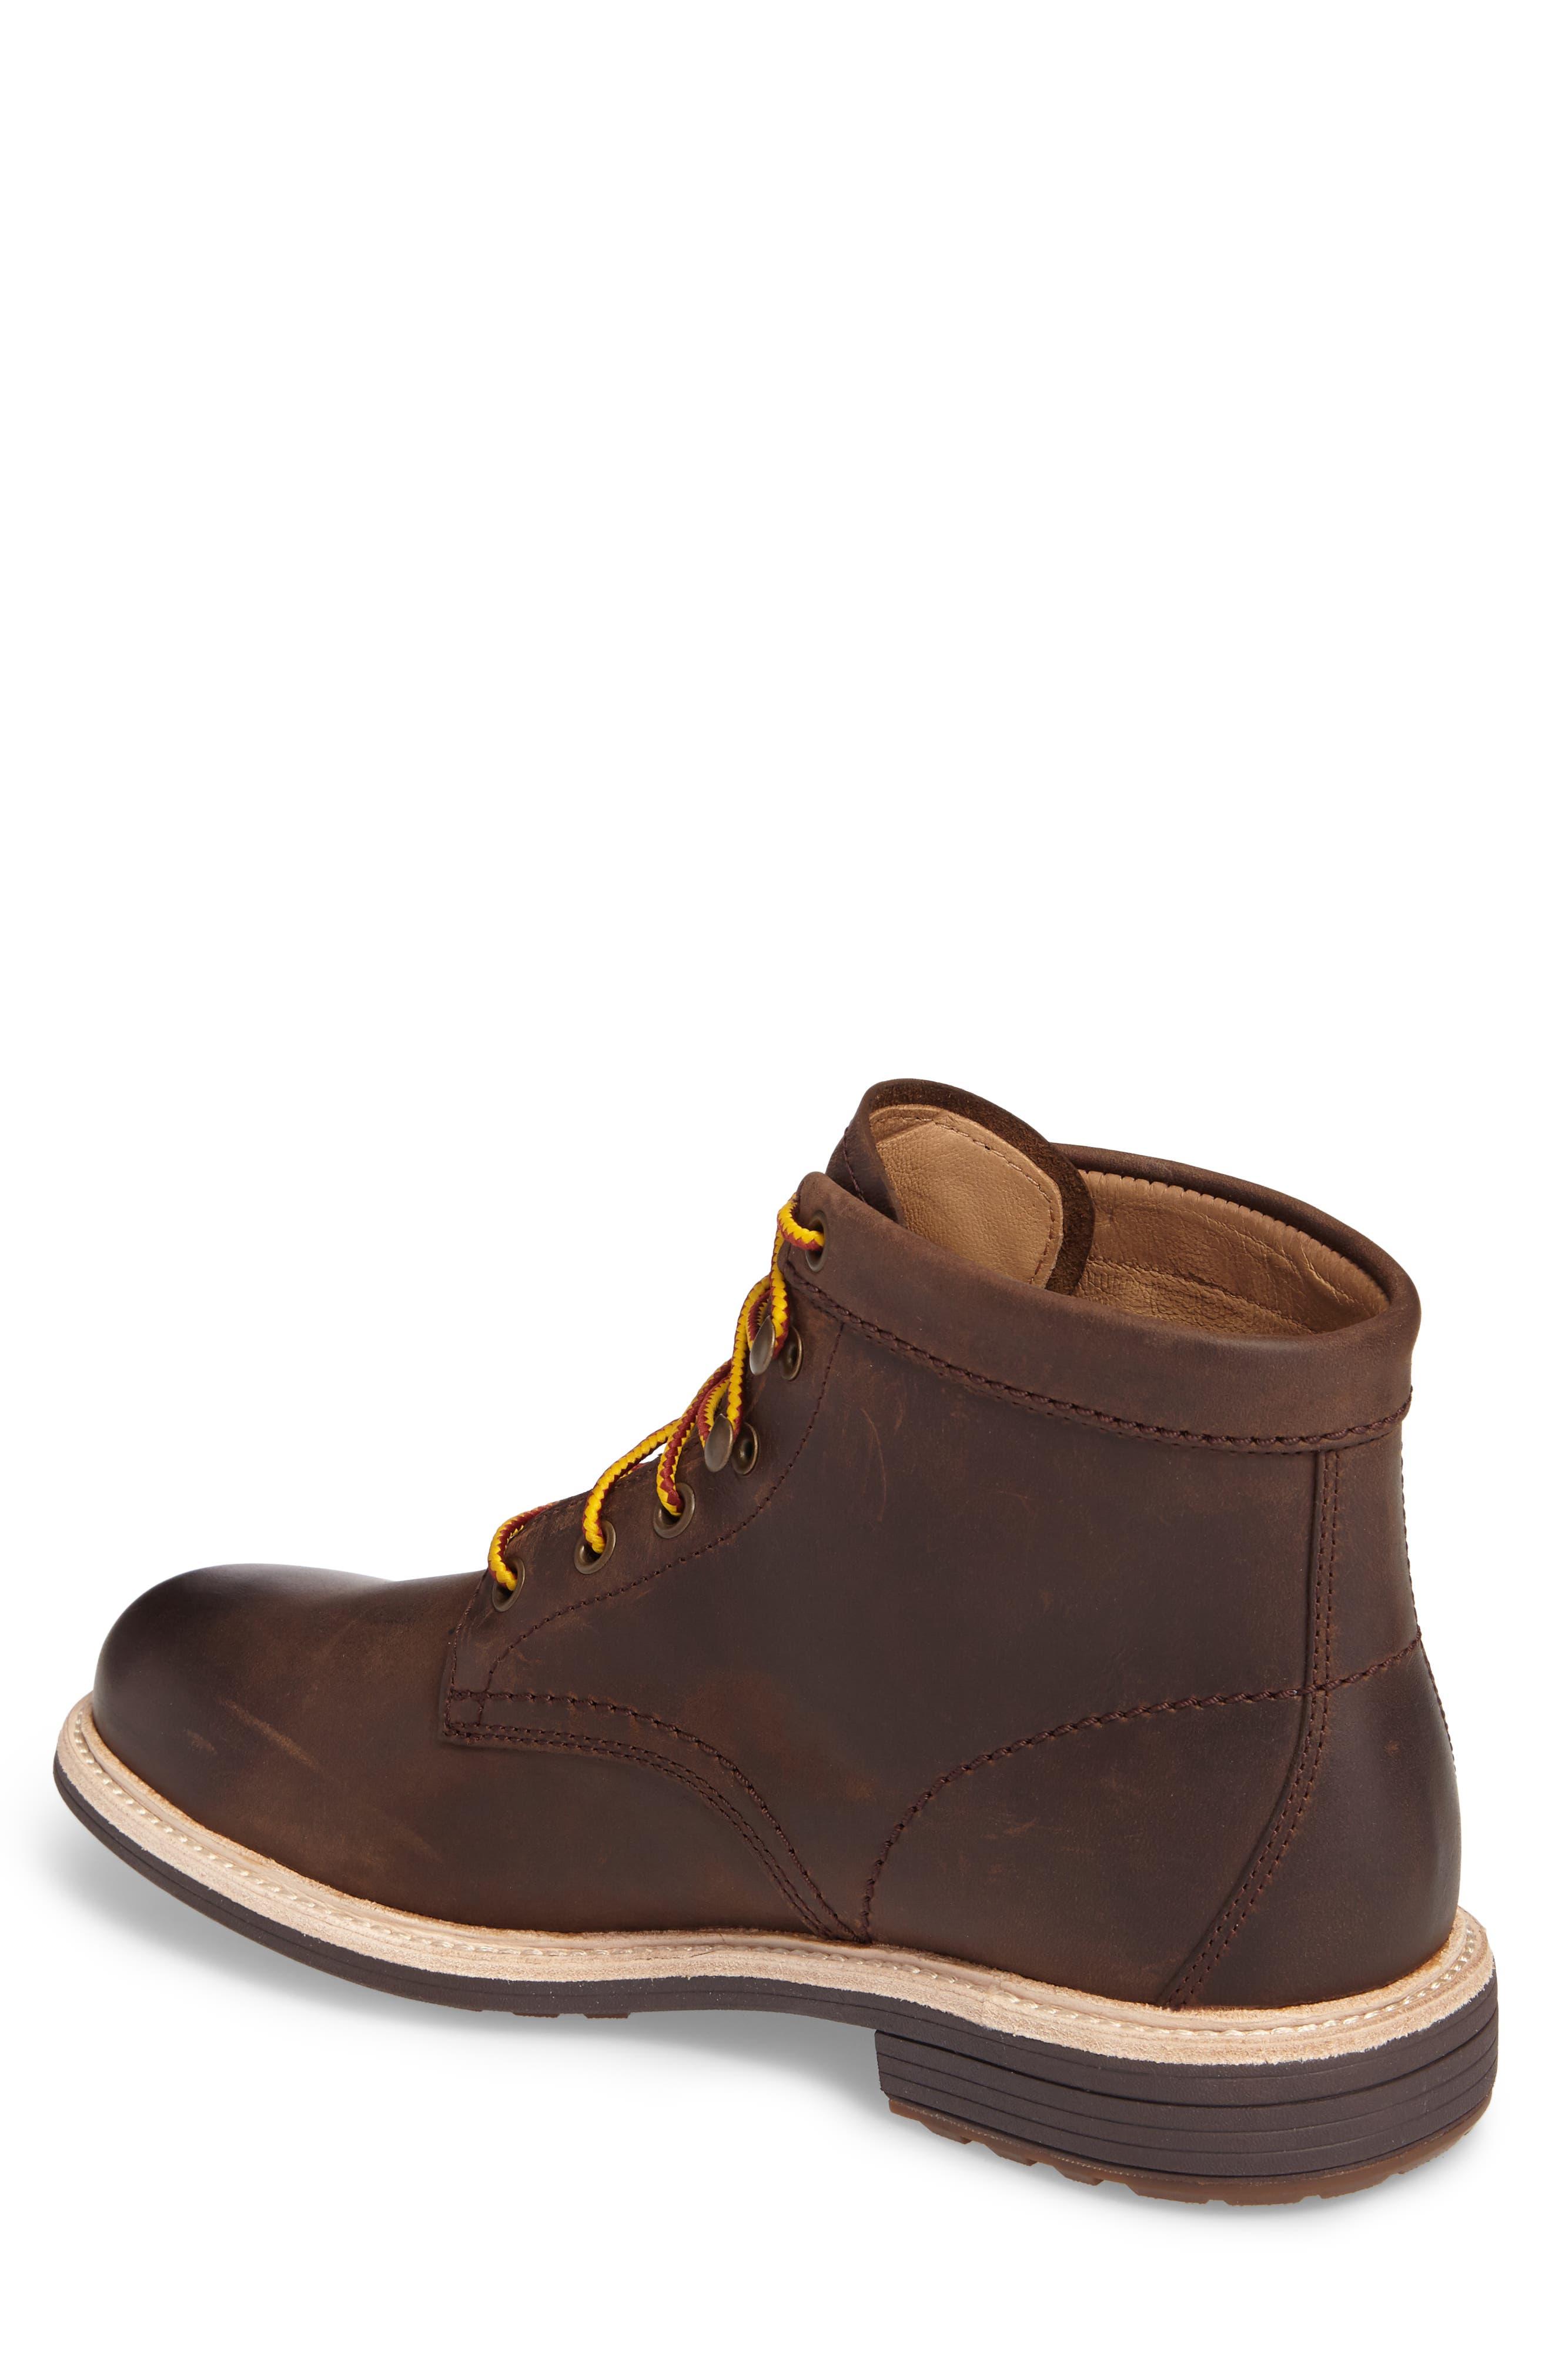 Vestmar Plain Toe Boot,                             Alternate thumbnail 2, color,                             Grizzly